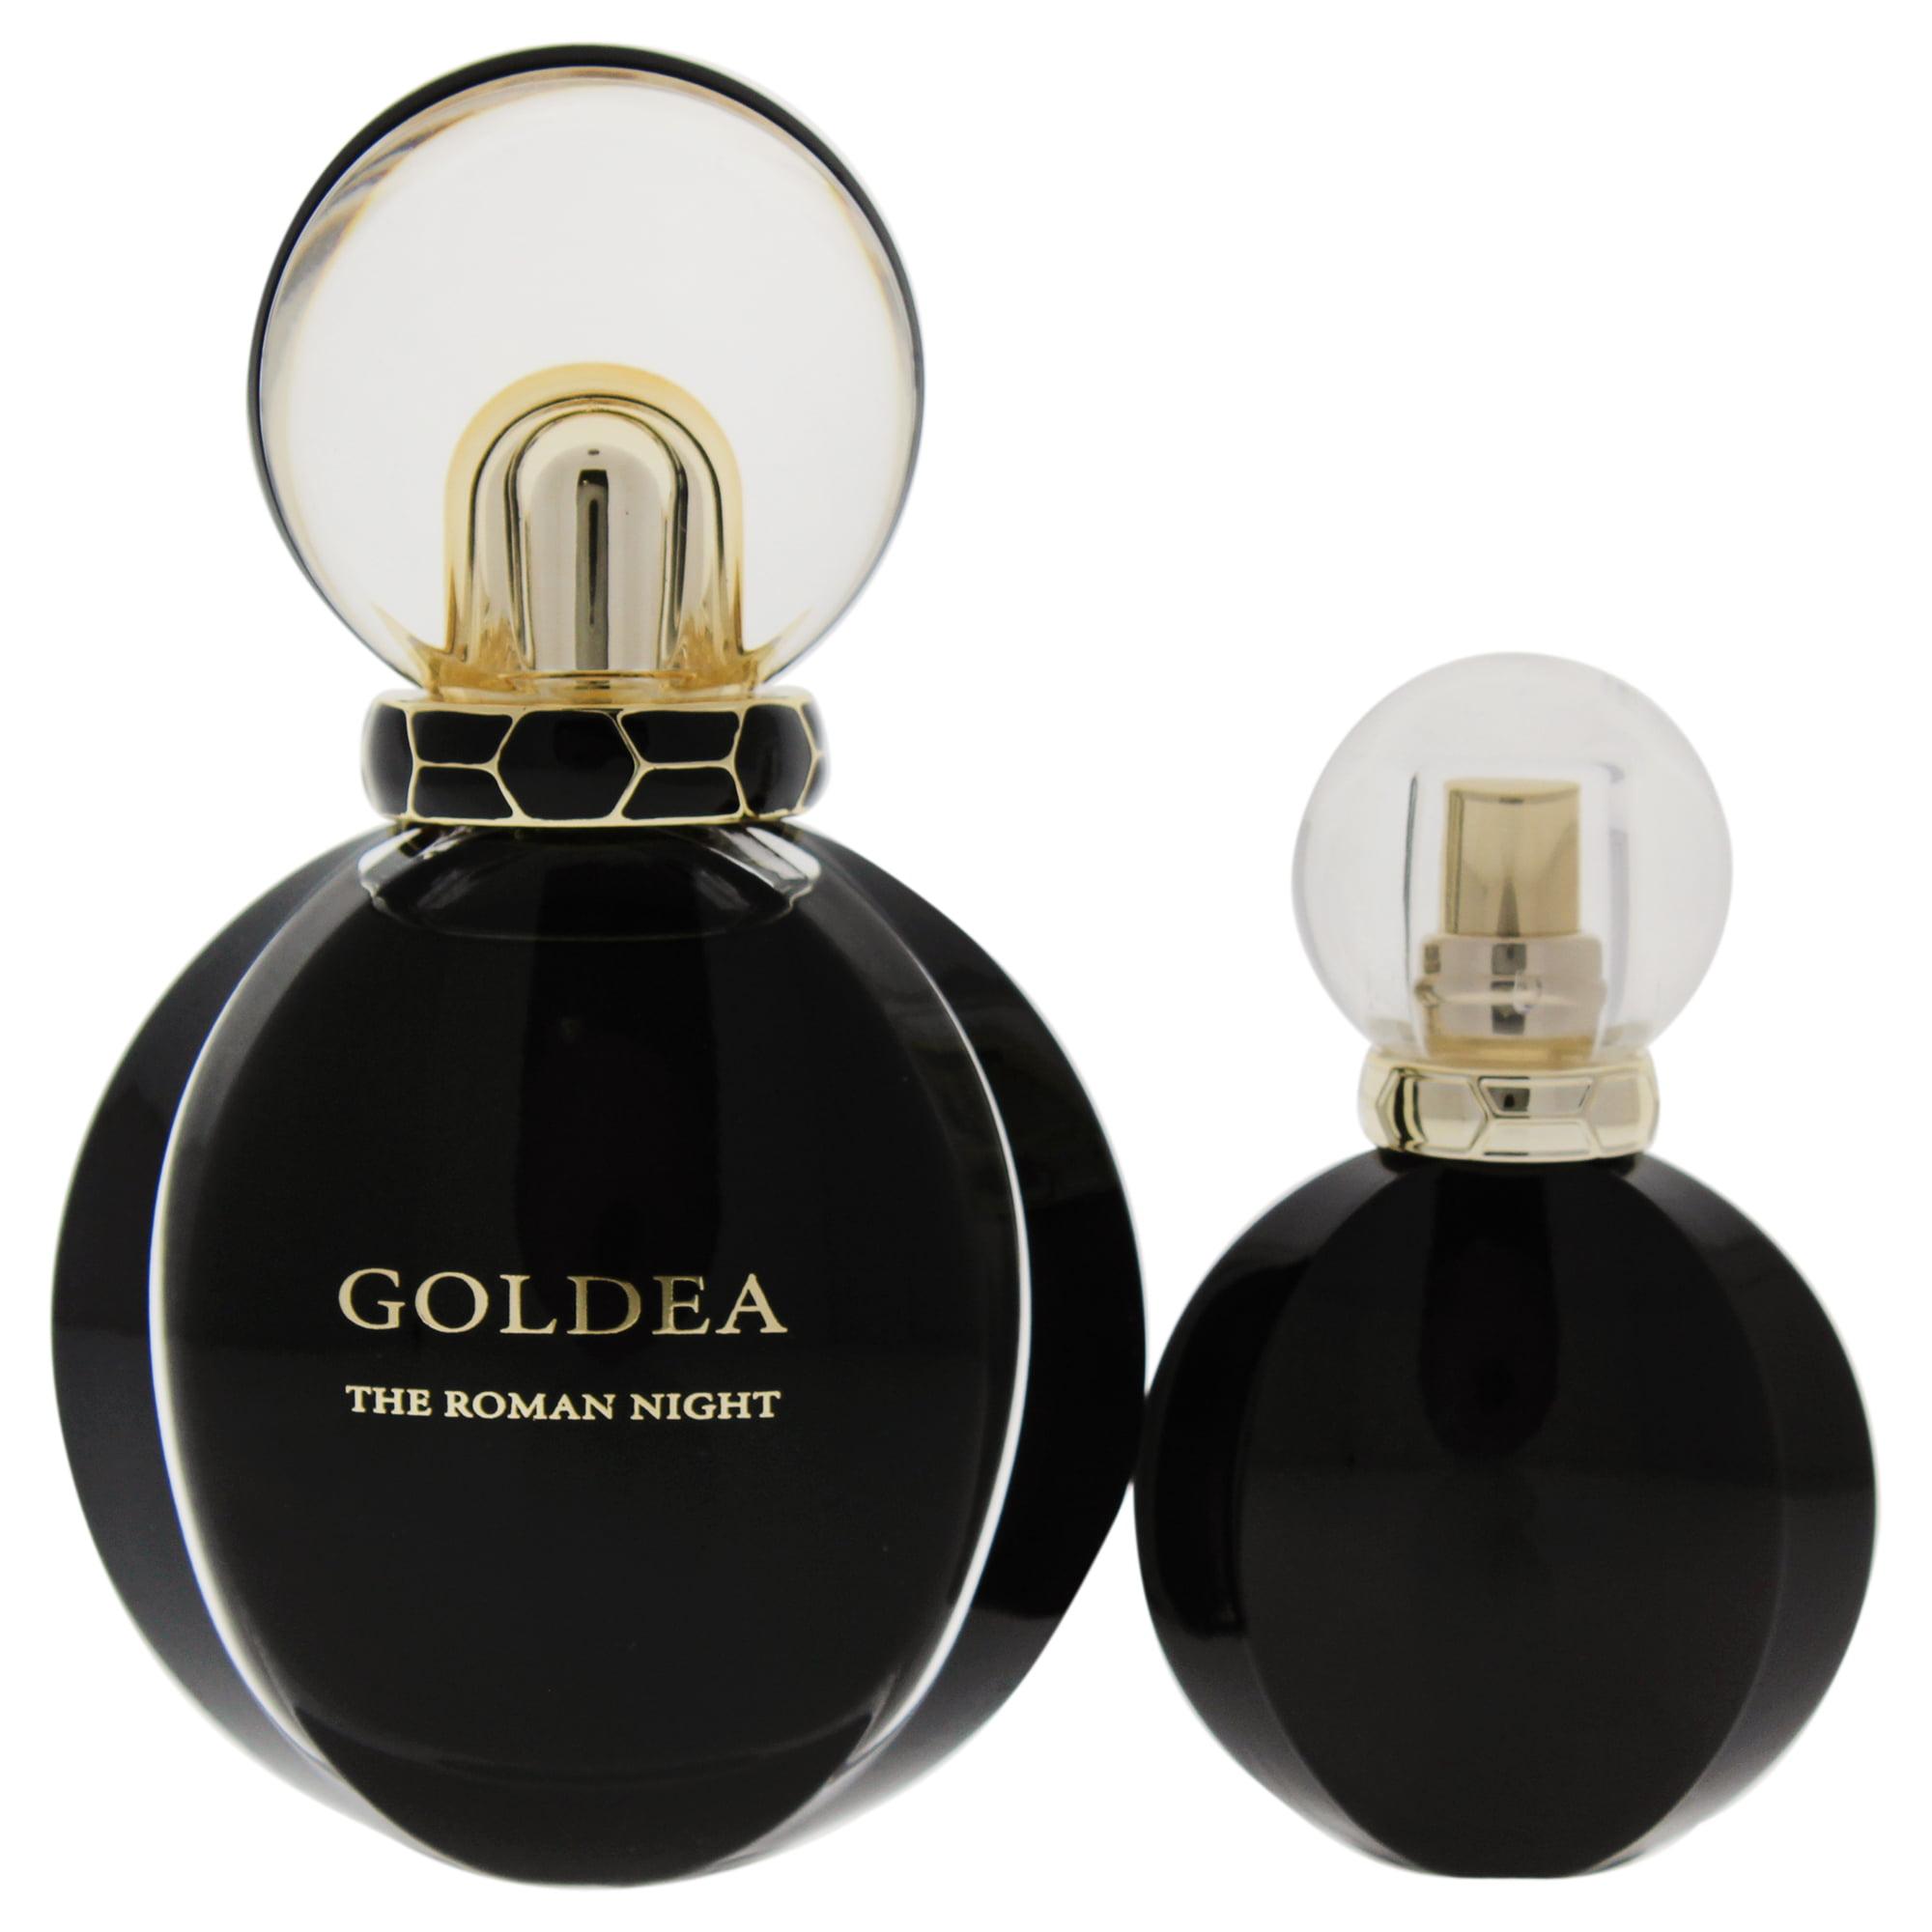 Bvlgari Goldea The Roman Night 1.7oz Sensual Eau De Parfum Spray, 0.5oz Sensual Eau De Parfum Spray 2 Pc Gift Set